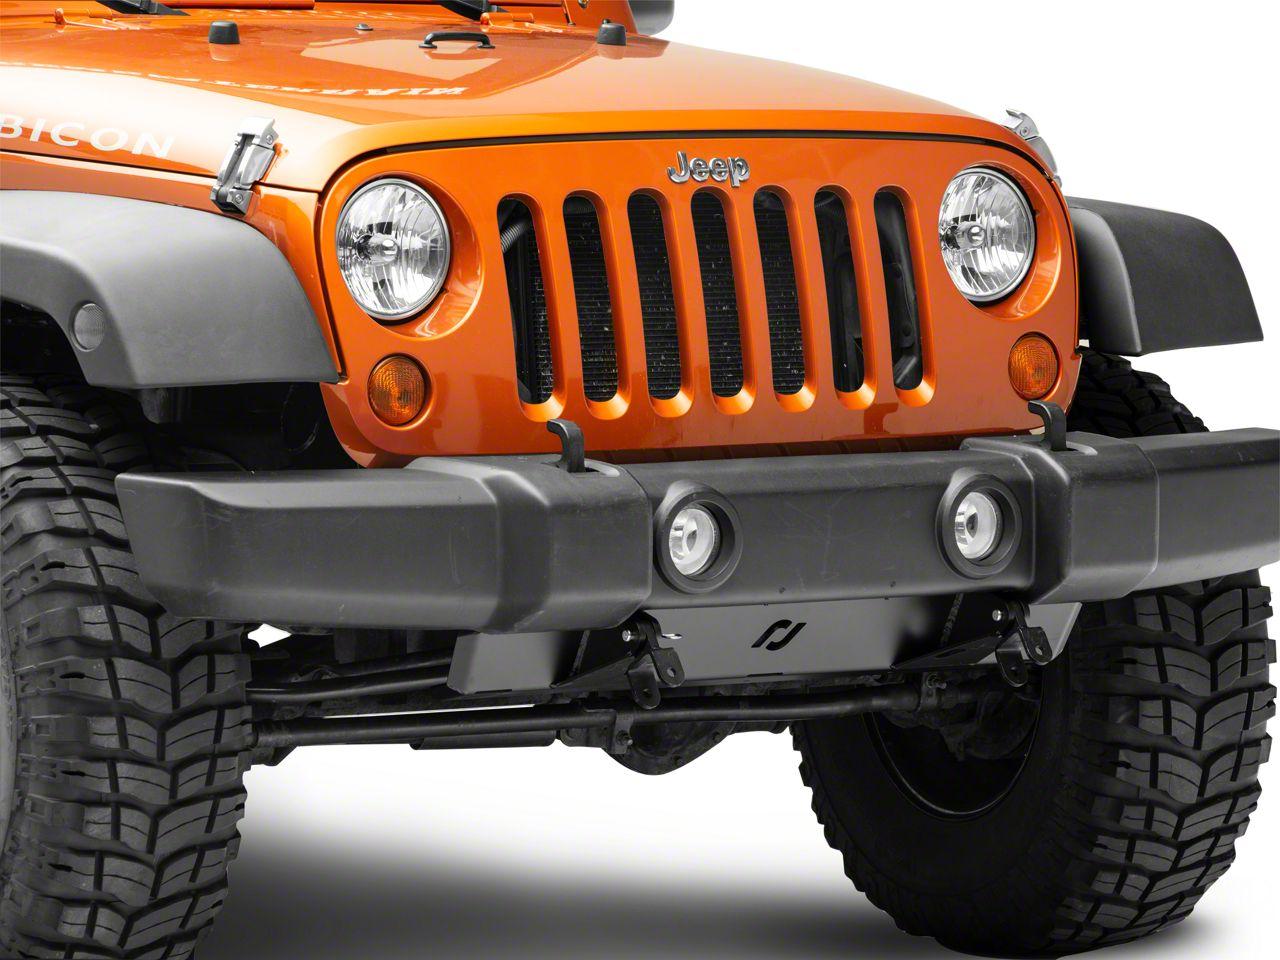 Rockjock Jeep Wrangler Tow Bar Mounting Kit Ce 9033jk 07 18 Jeep Wrangler Jk